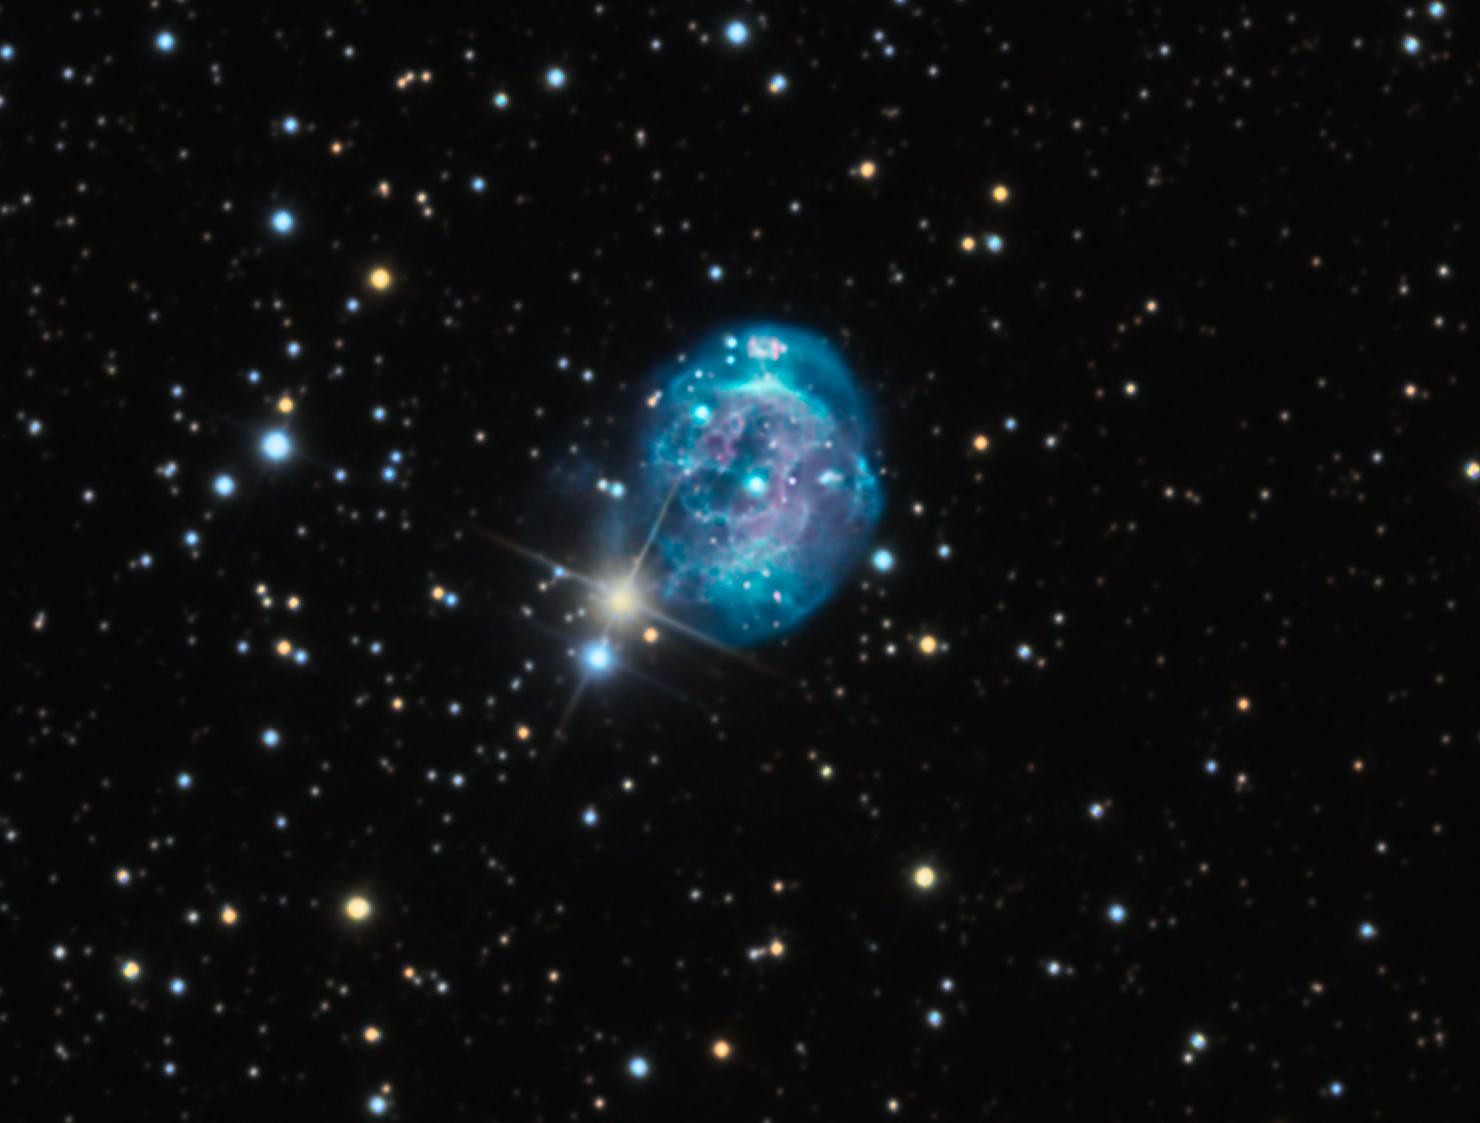 Birth of Cool: Photographers Catch Brilliant Fetus Nebula